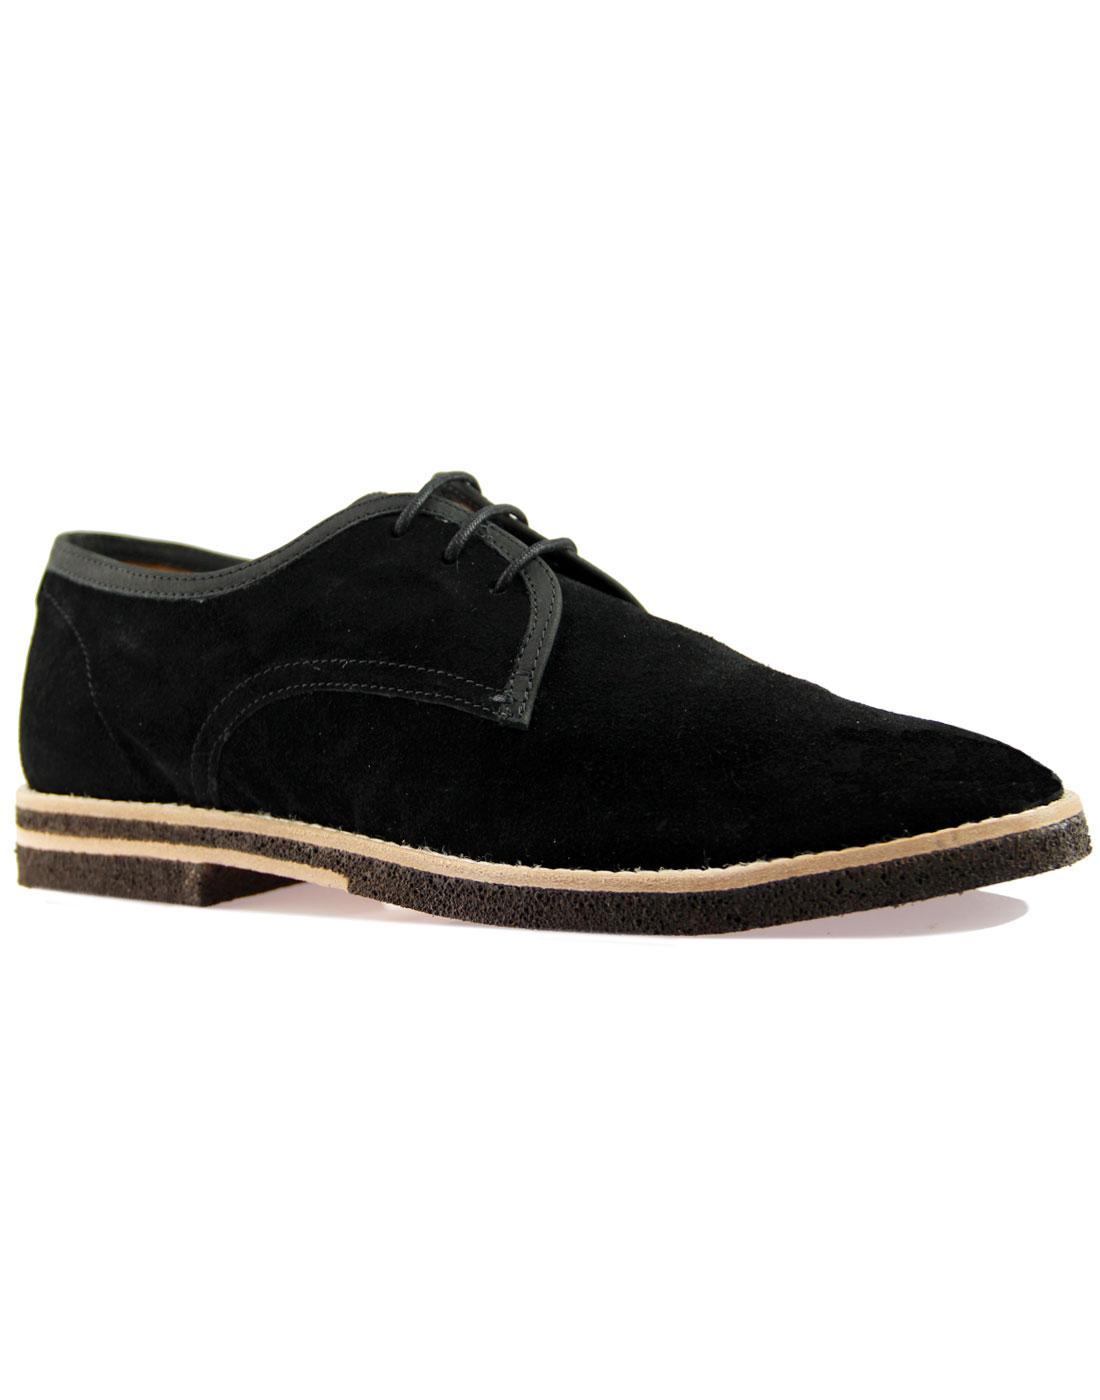 Agadir HUDSON Retro Lightweight Suede Derby Shoes